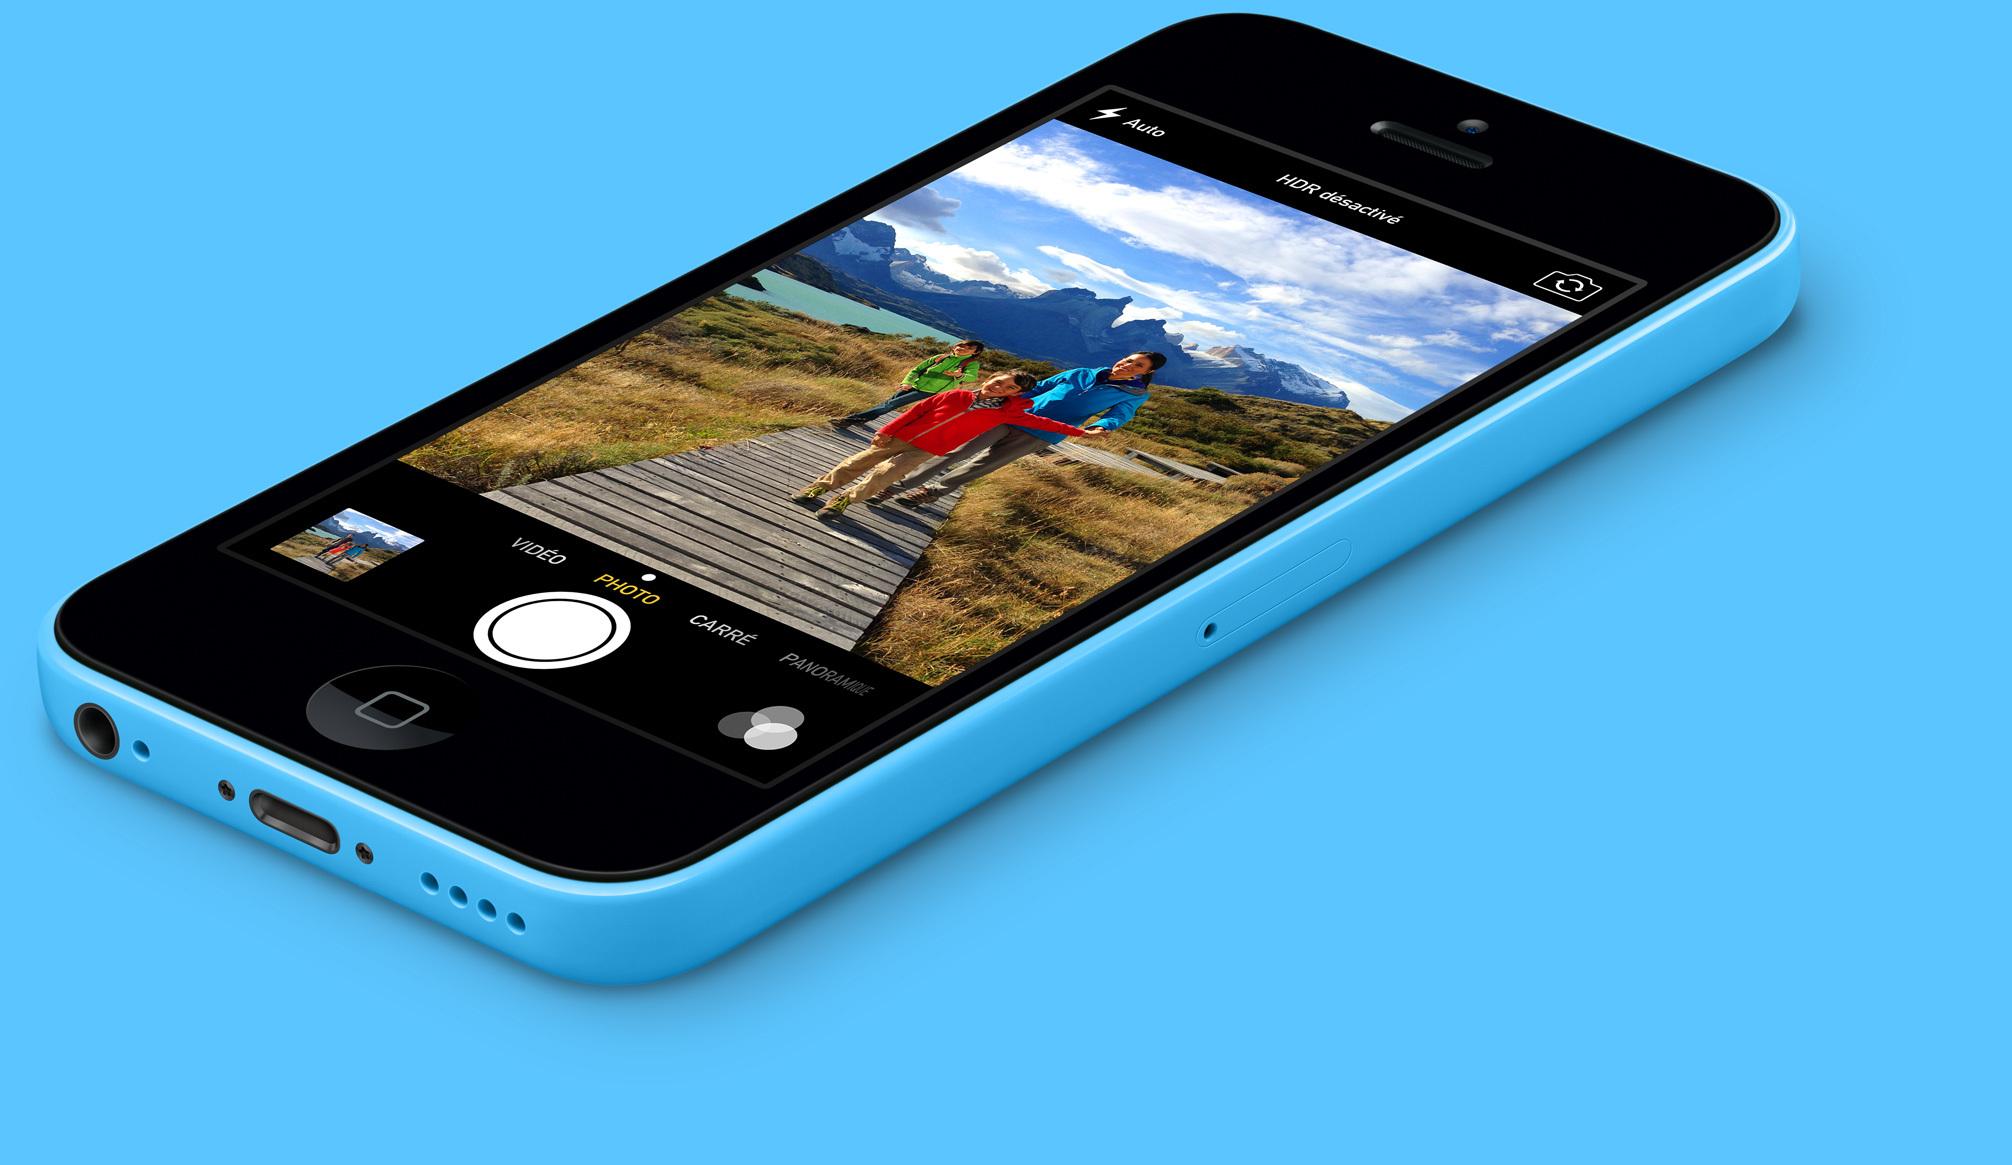 Iphone 5c In Blue